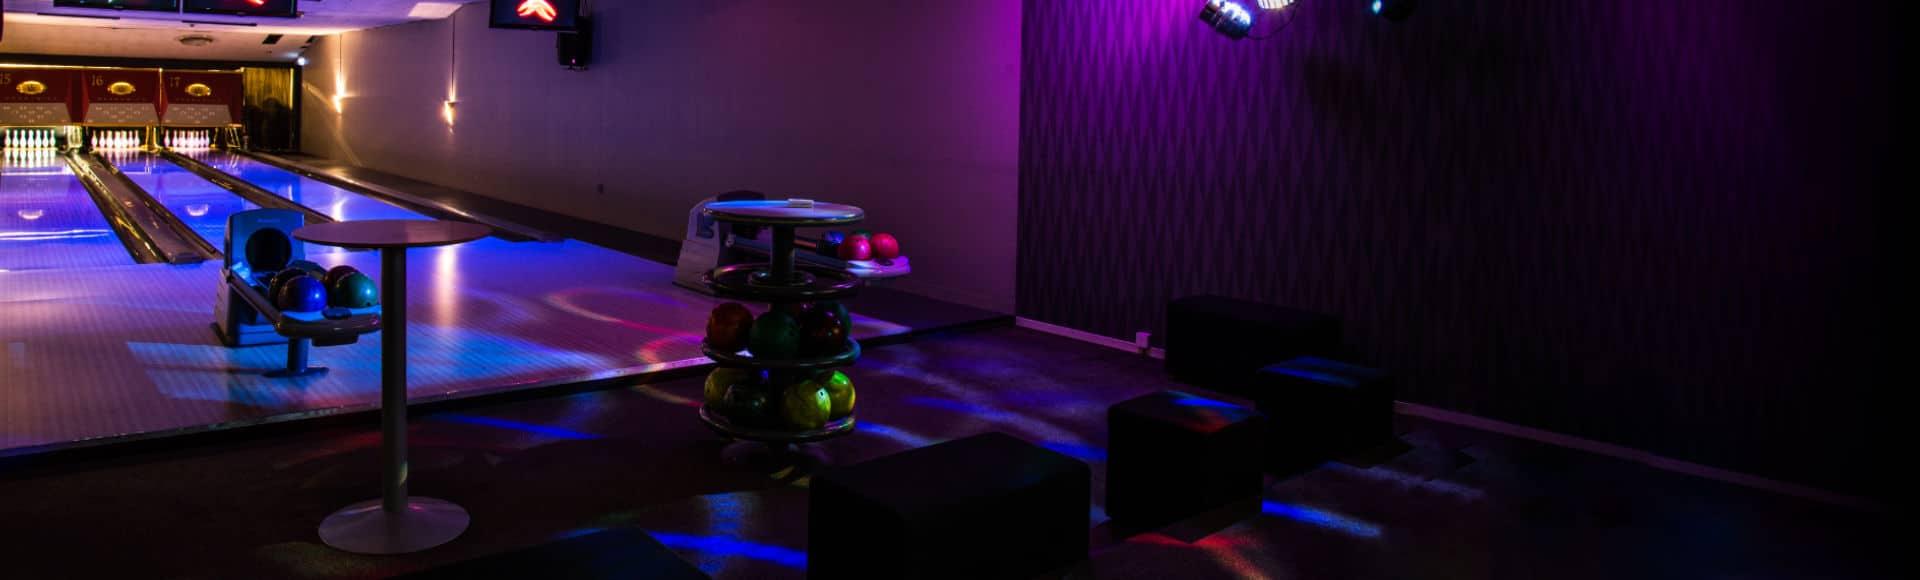 VIP-lounge och bowling